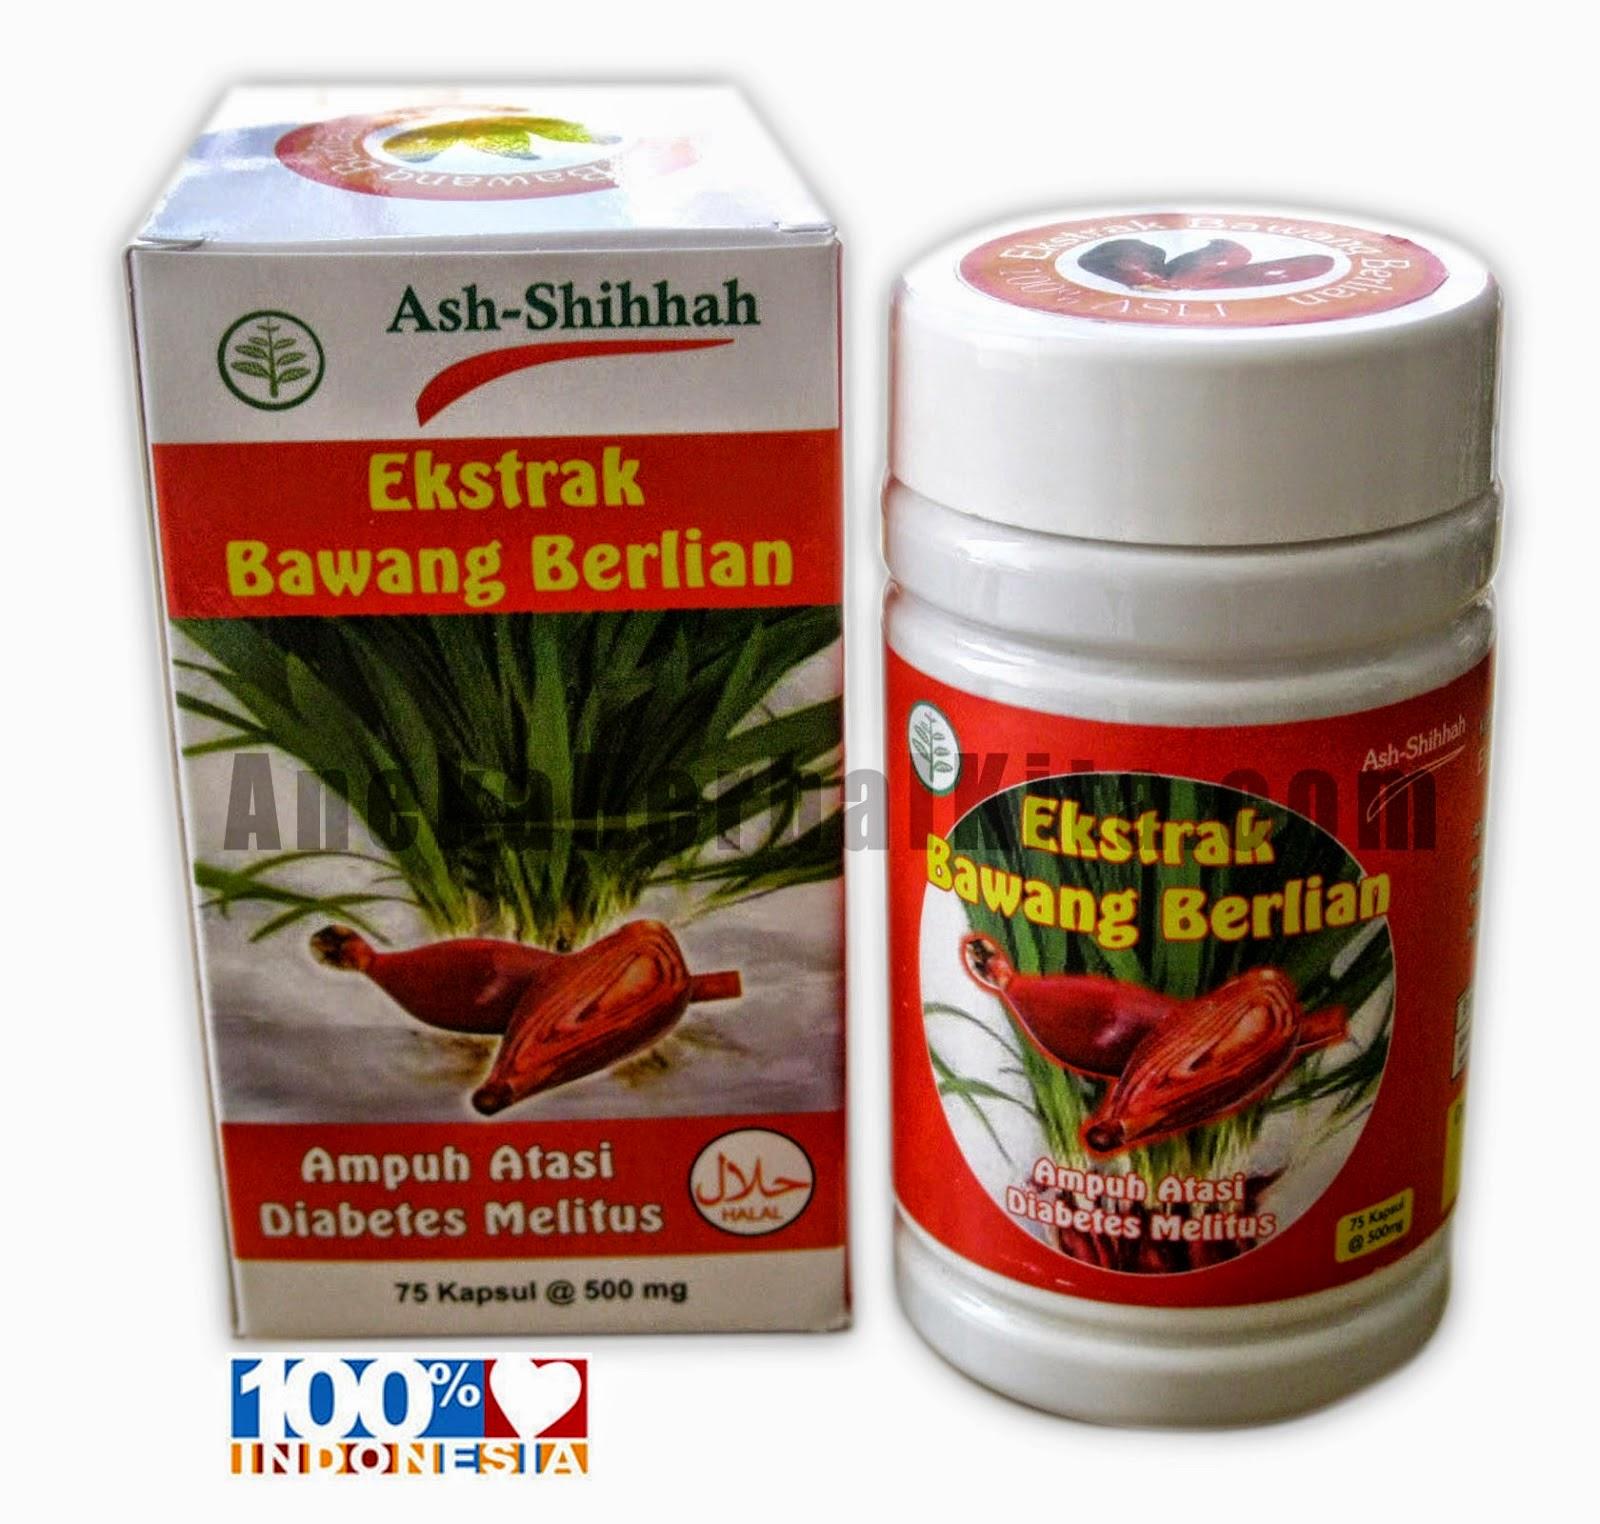 virgin herbal agen dan distributor resmi obat herbal pusat obat